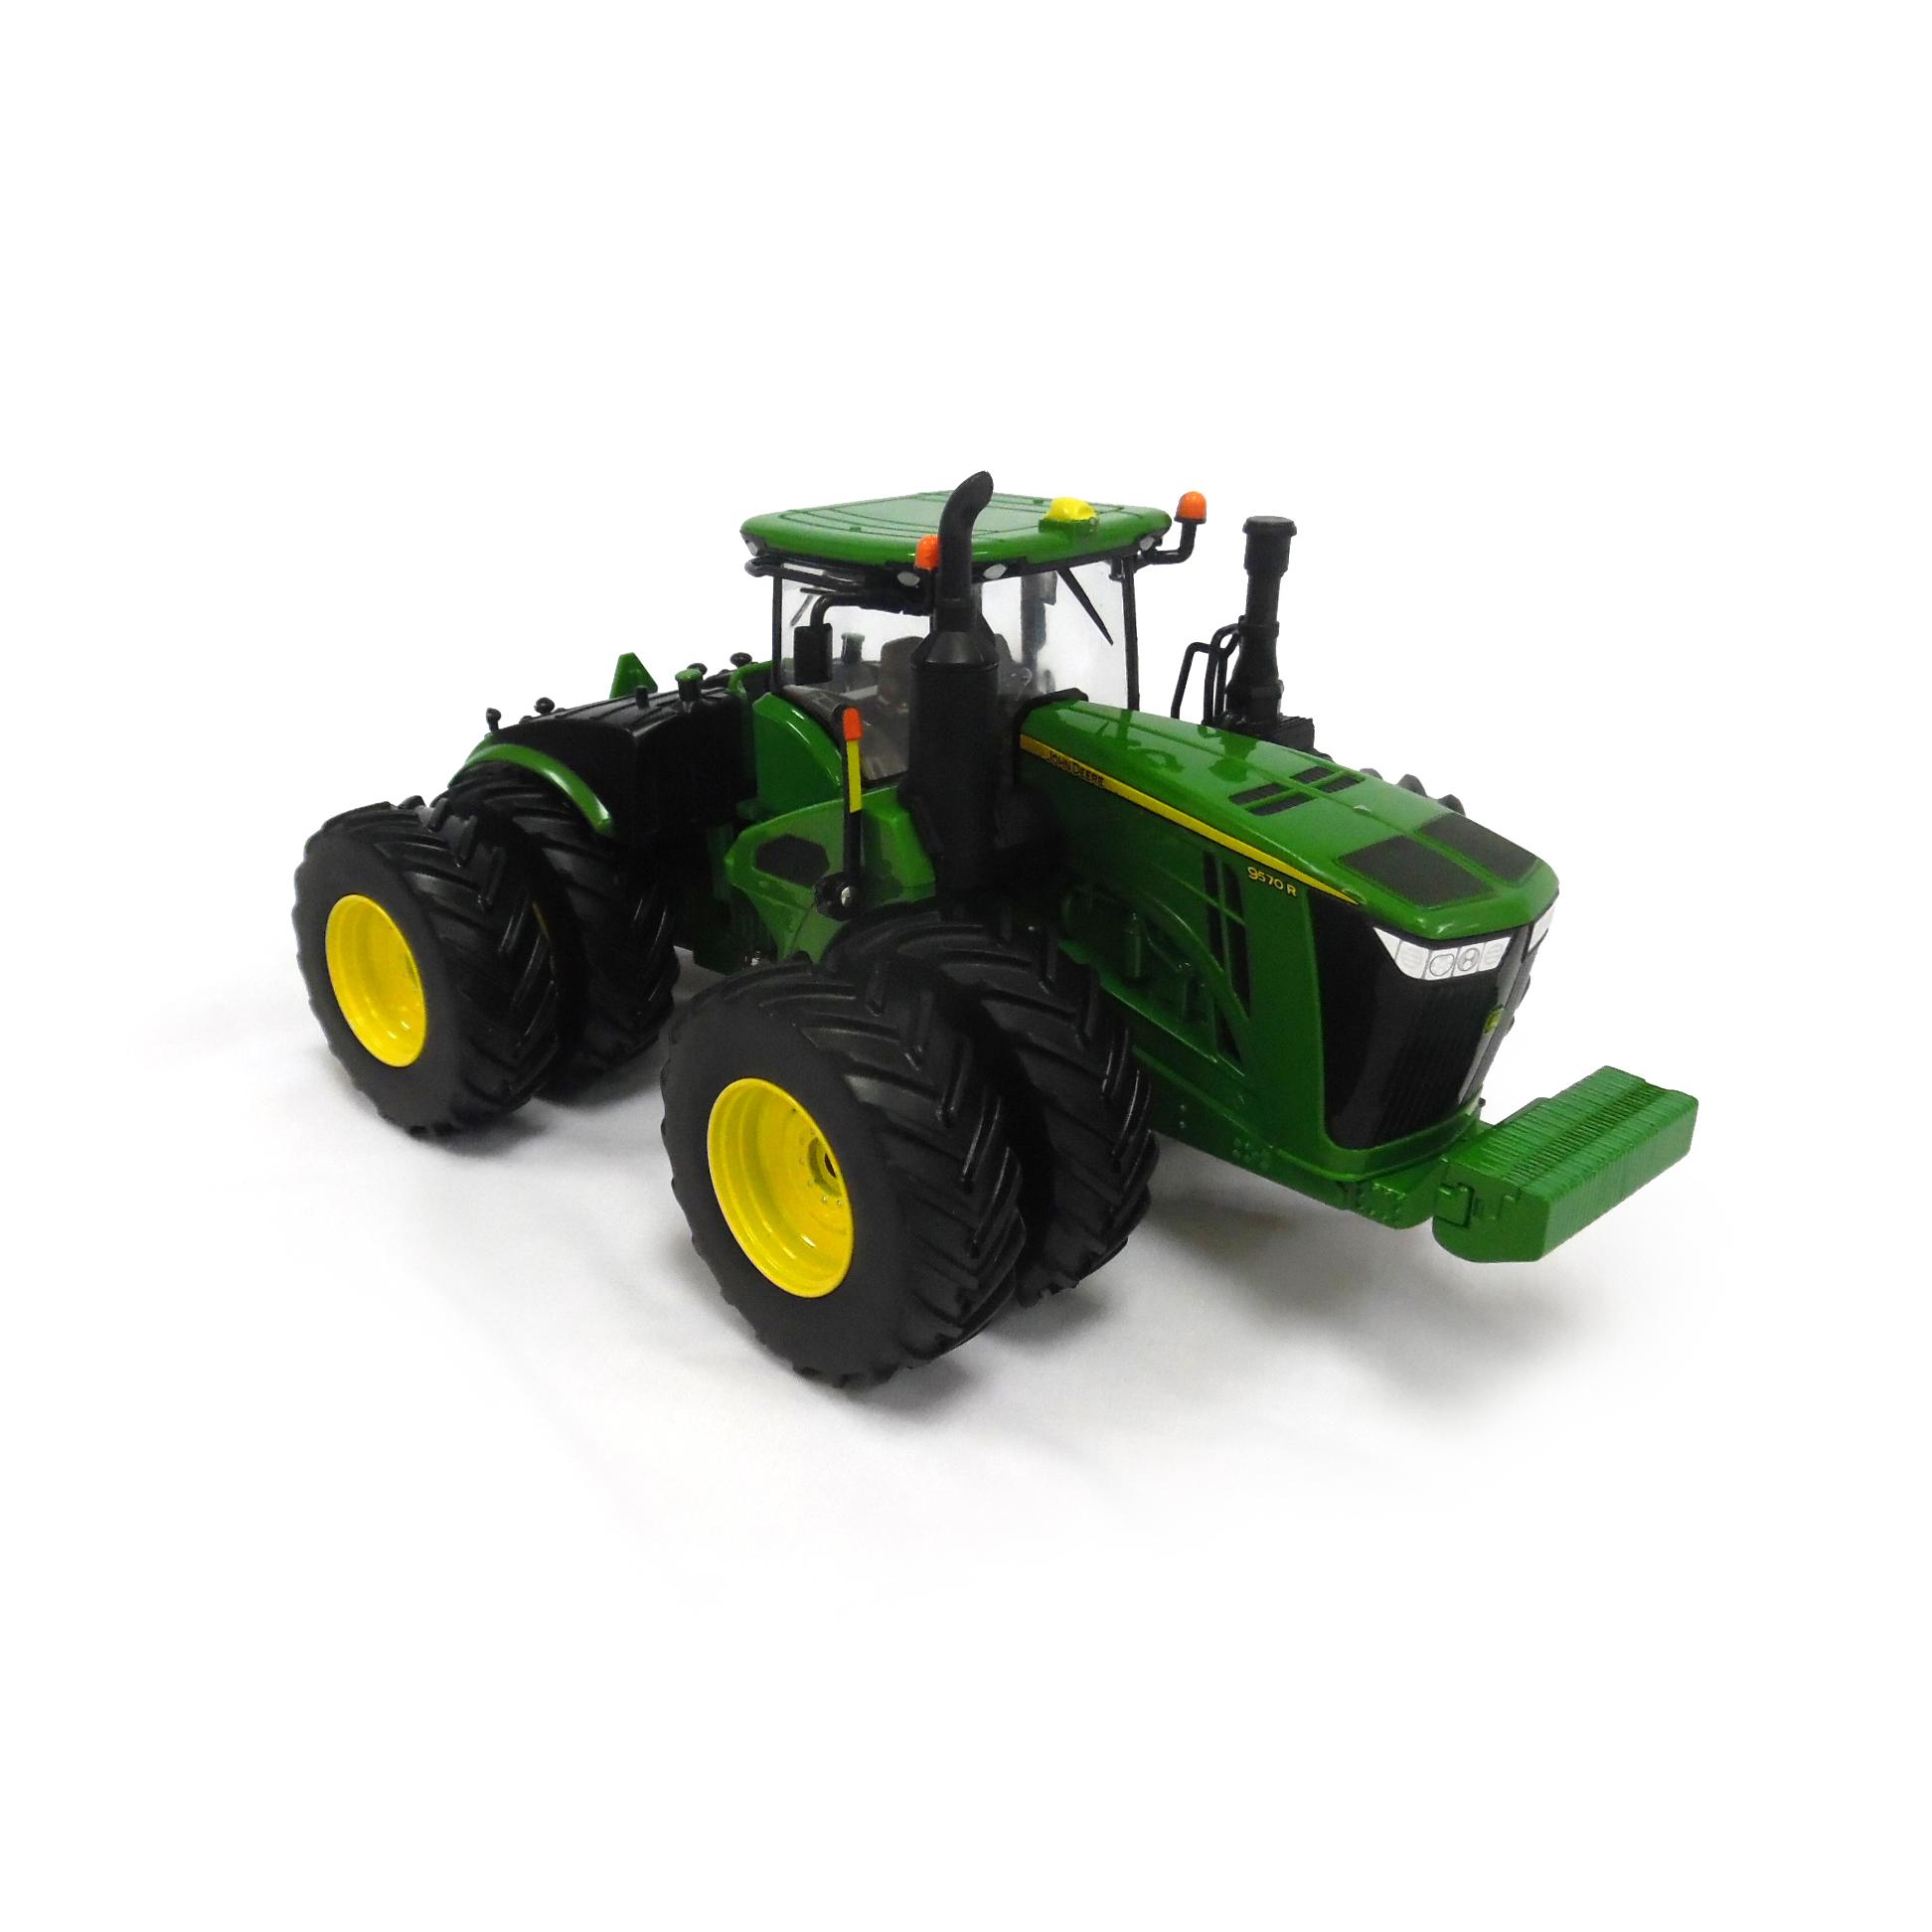 1:16 John Deere 9570R Prestige Tractor by Tomy Inc